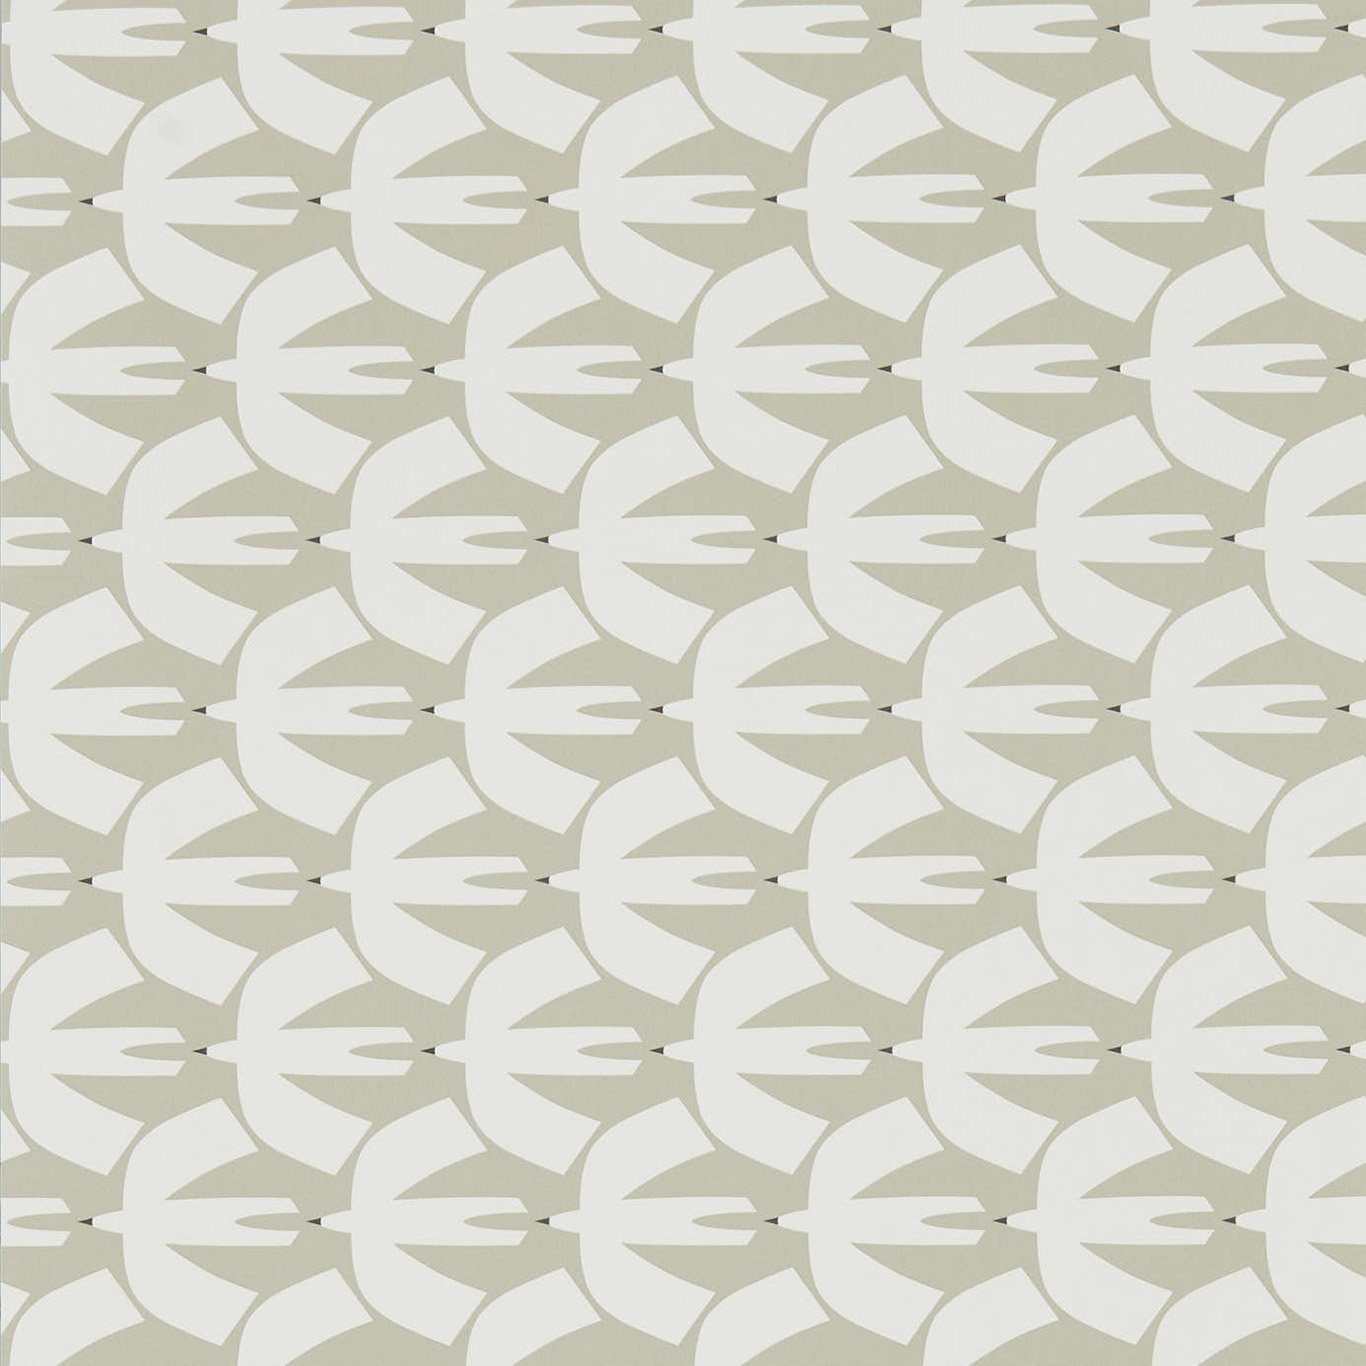 Image of Scion Pajaro Pebble Wallpaper 111826